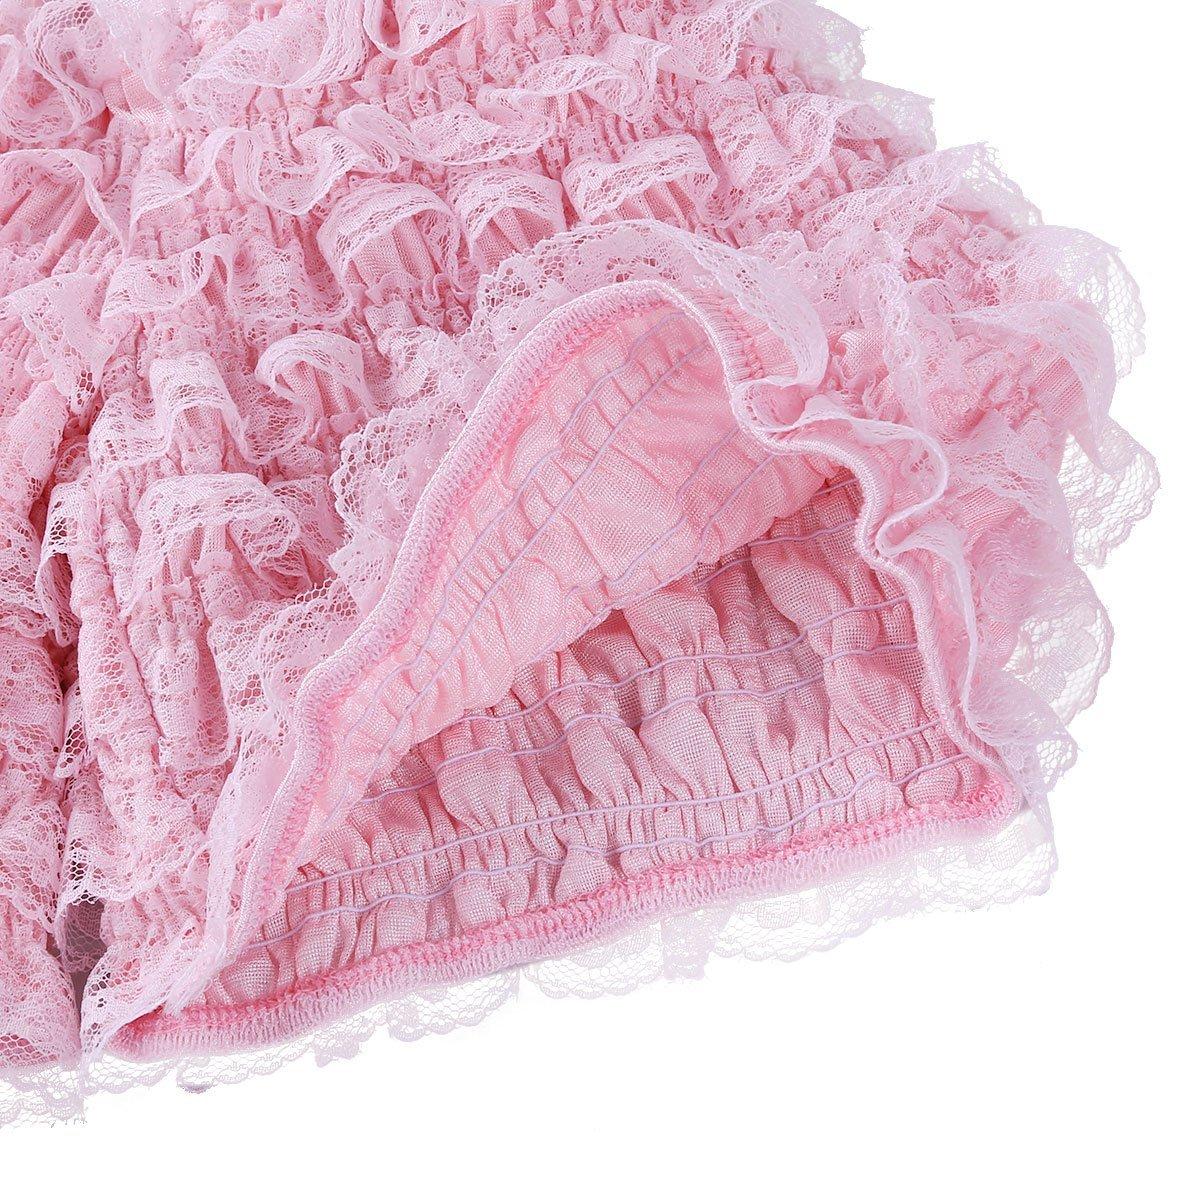 iiniim Pantalon Court Femme Victorien Dentelle Volants Culotte Bouffante Lolita Pumpkin Shorts de Danse Pants Sarouel Mode Short de Pyjama M-XL